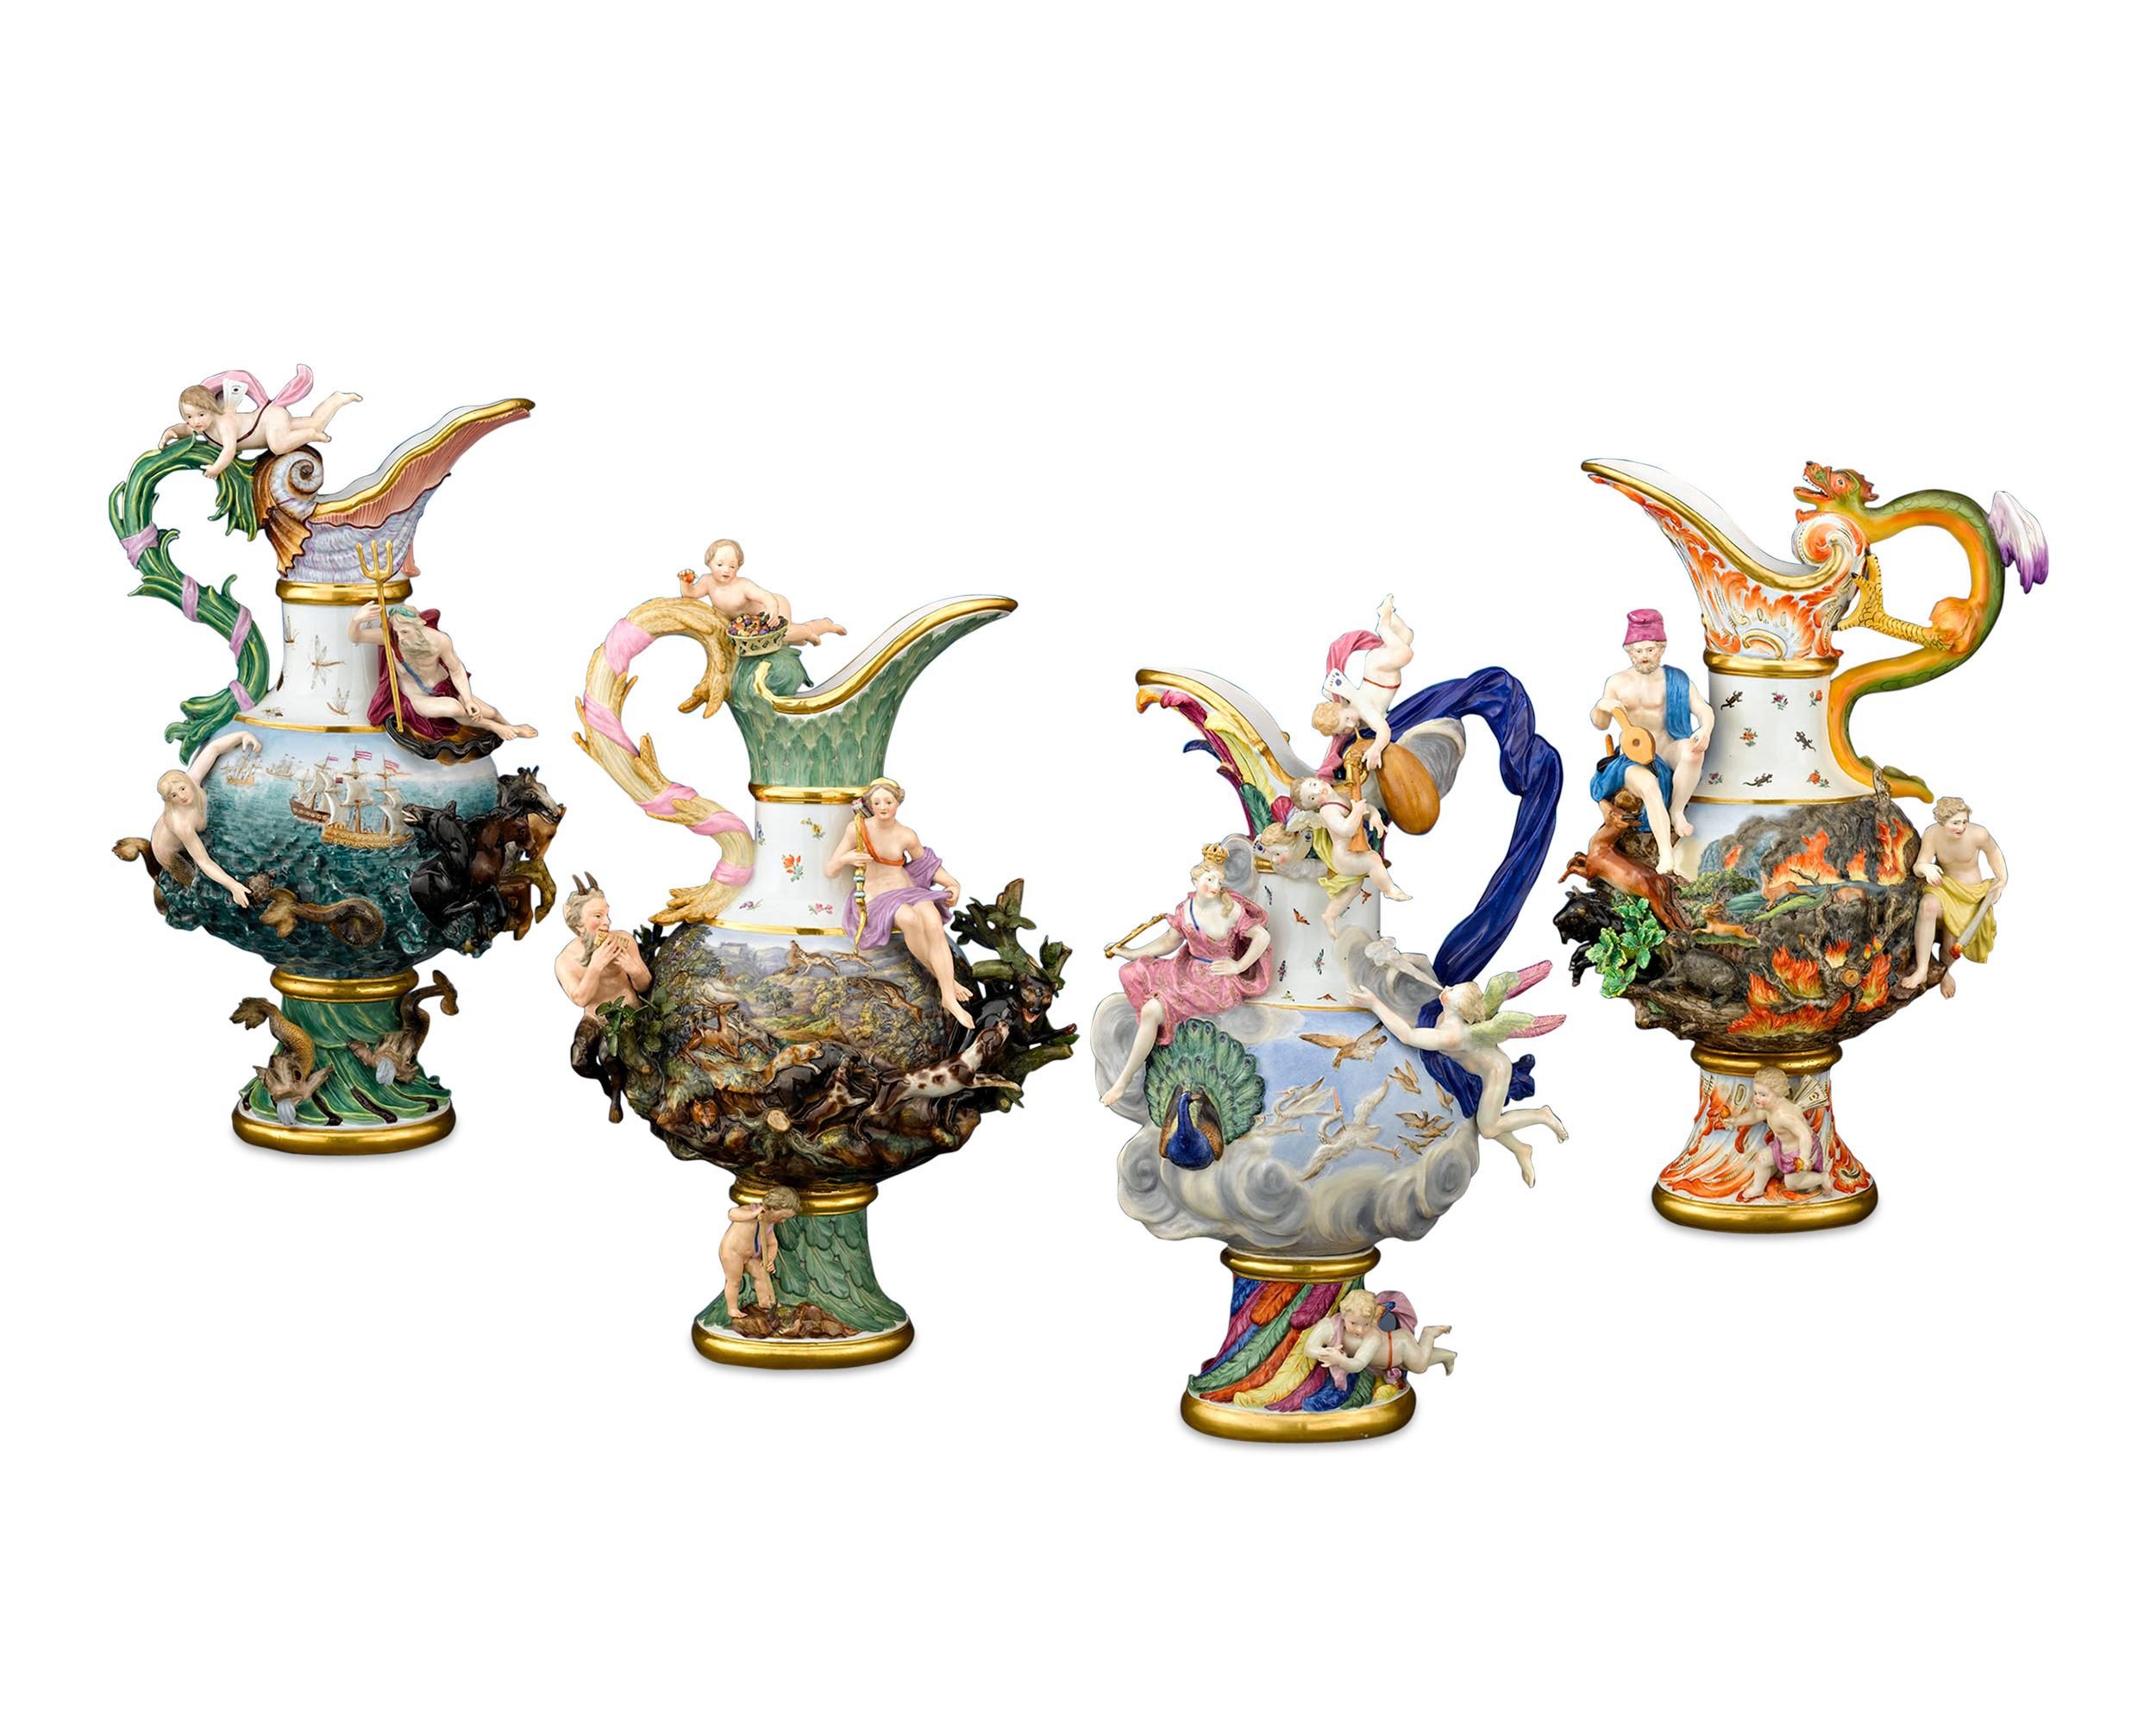 Four_Elements_Porcelain_Ewers_by_Meissen